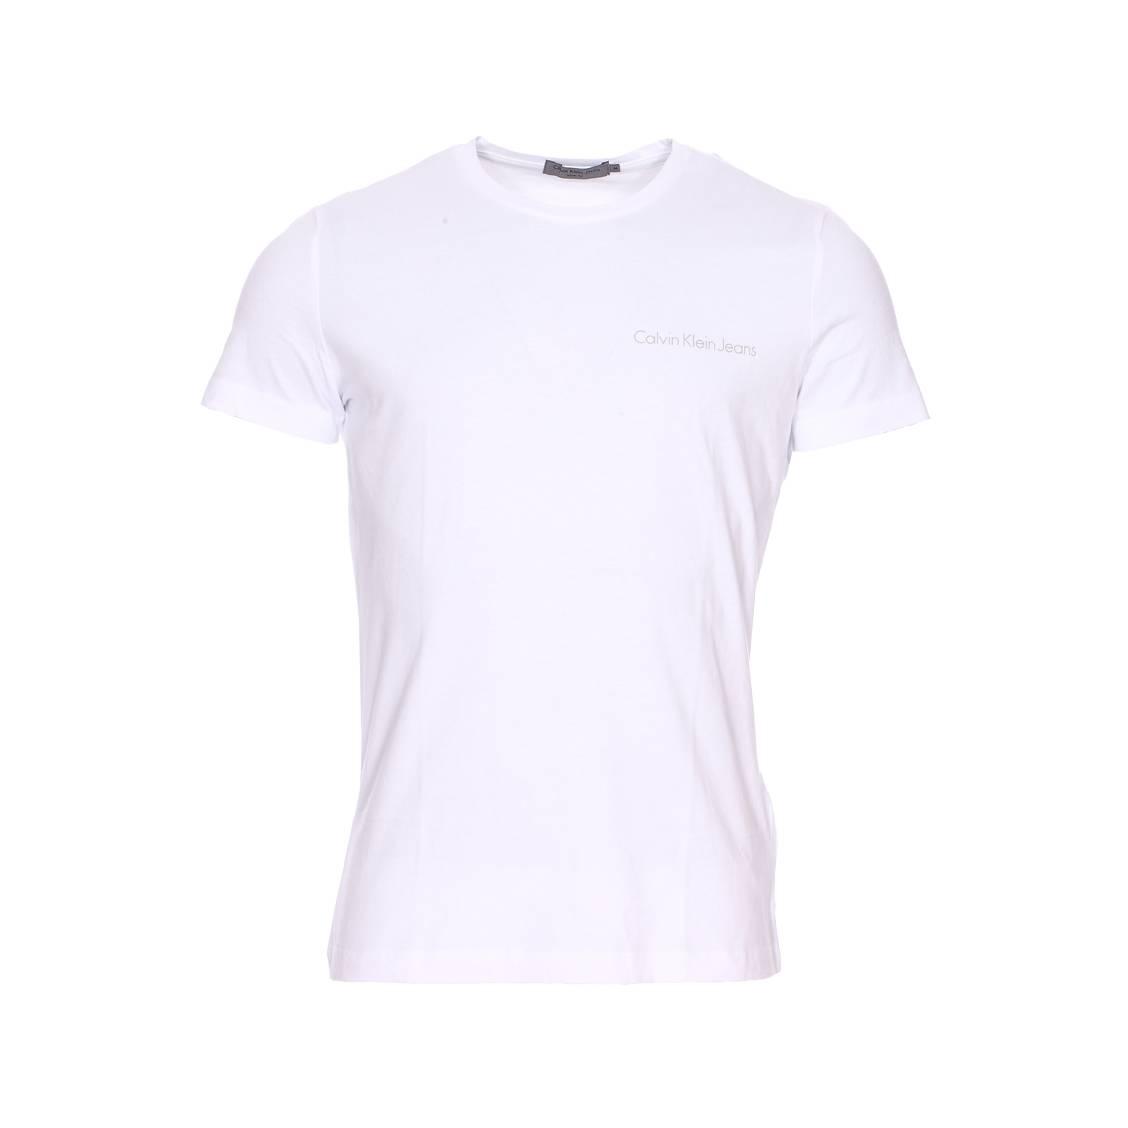 Tee-shirt col rond  typoko en coton blanc floqué